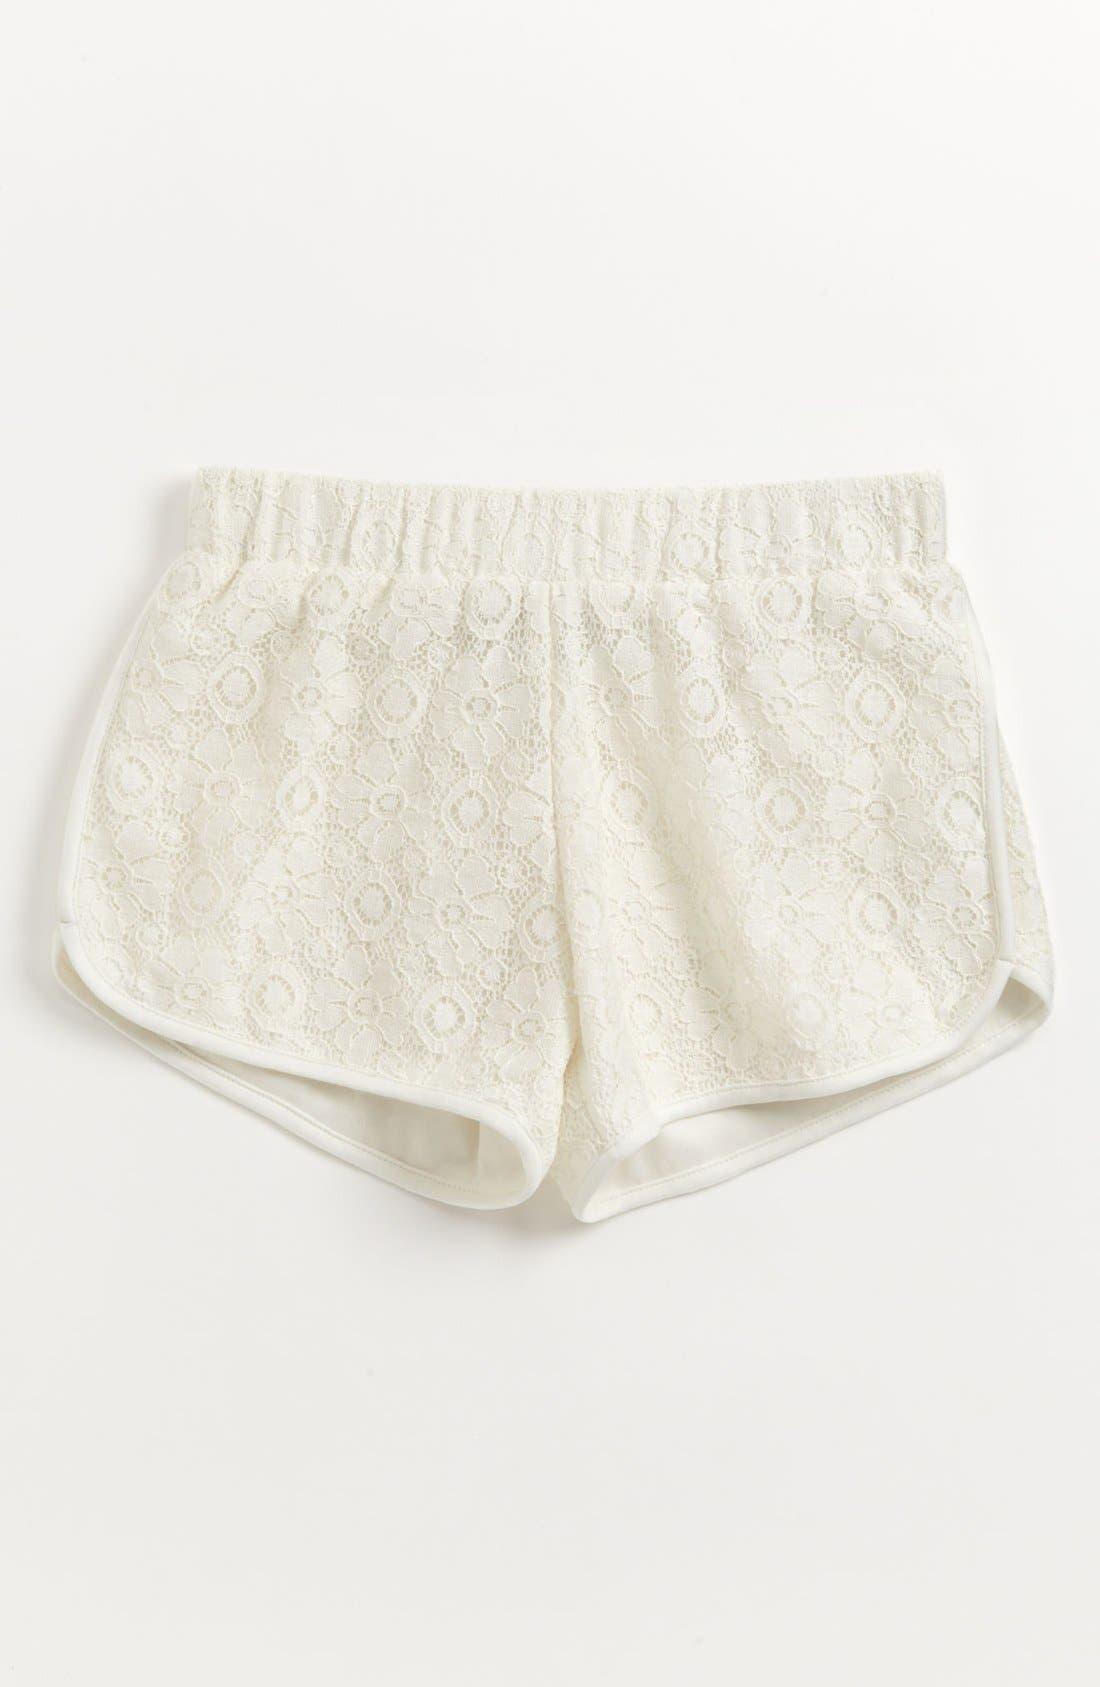 Alternate Image 1 Selected - Mia Chica Dolphin Hem Shorts (Big Girls)